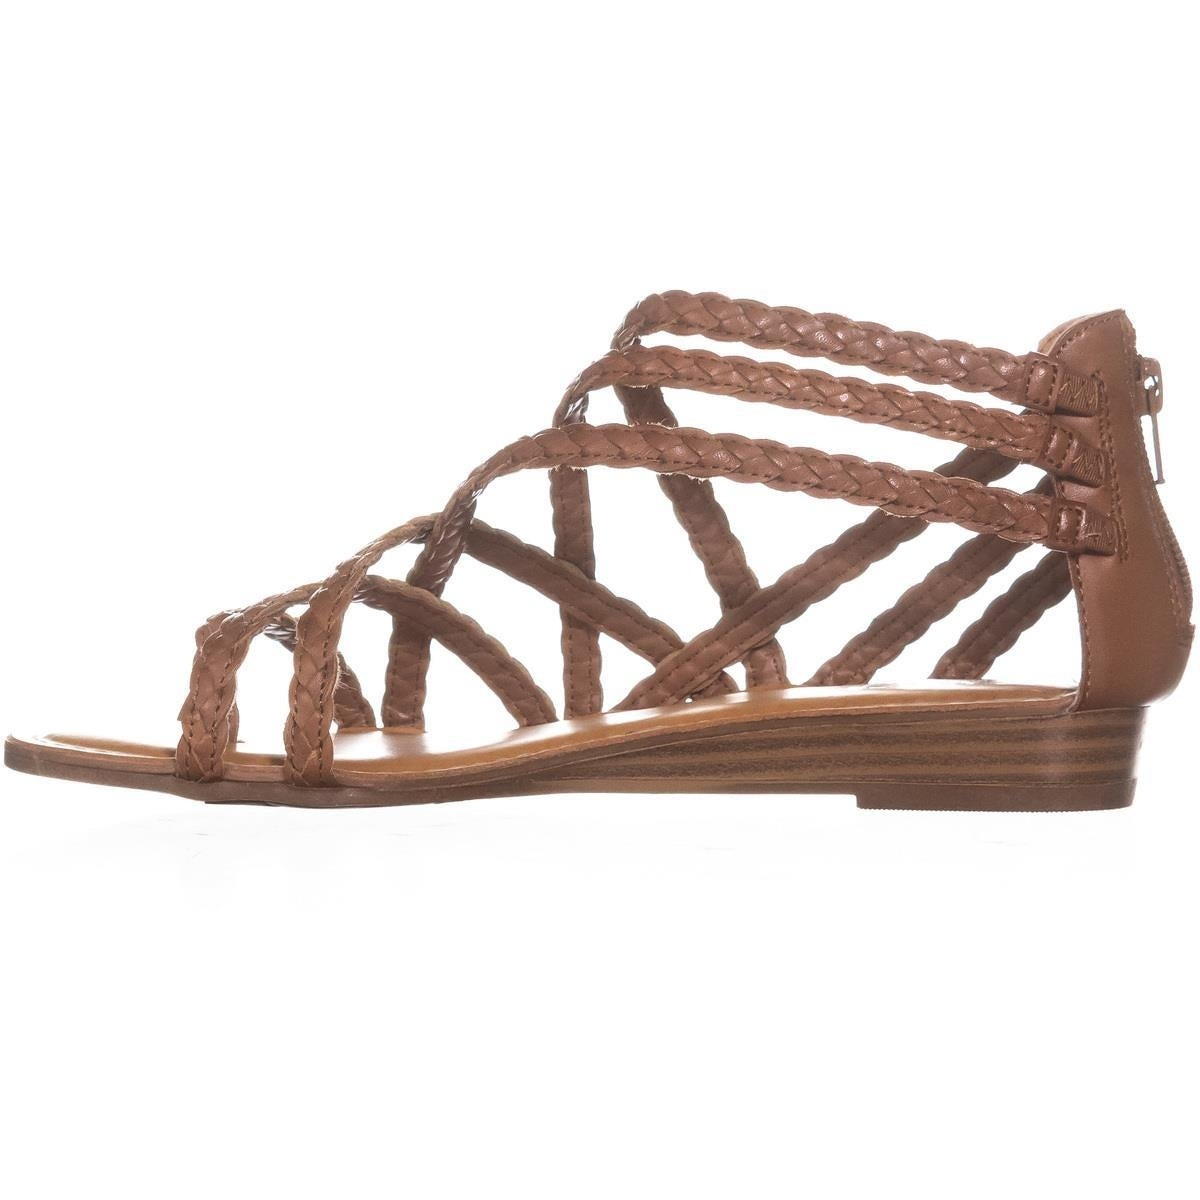 2ac0f6a7d9c11 Shop Carlos By Carlos Santana Amara 2 Braided Strap Sandals